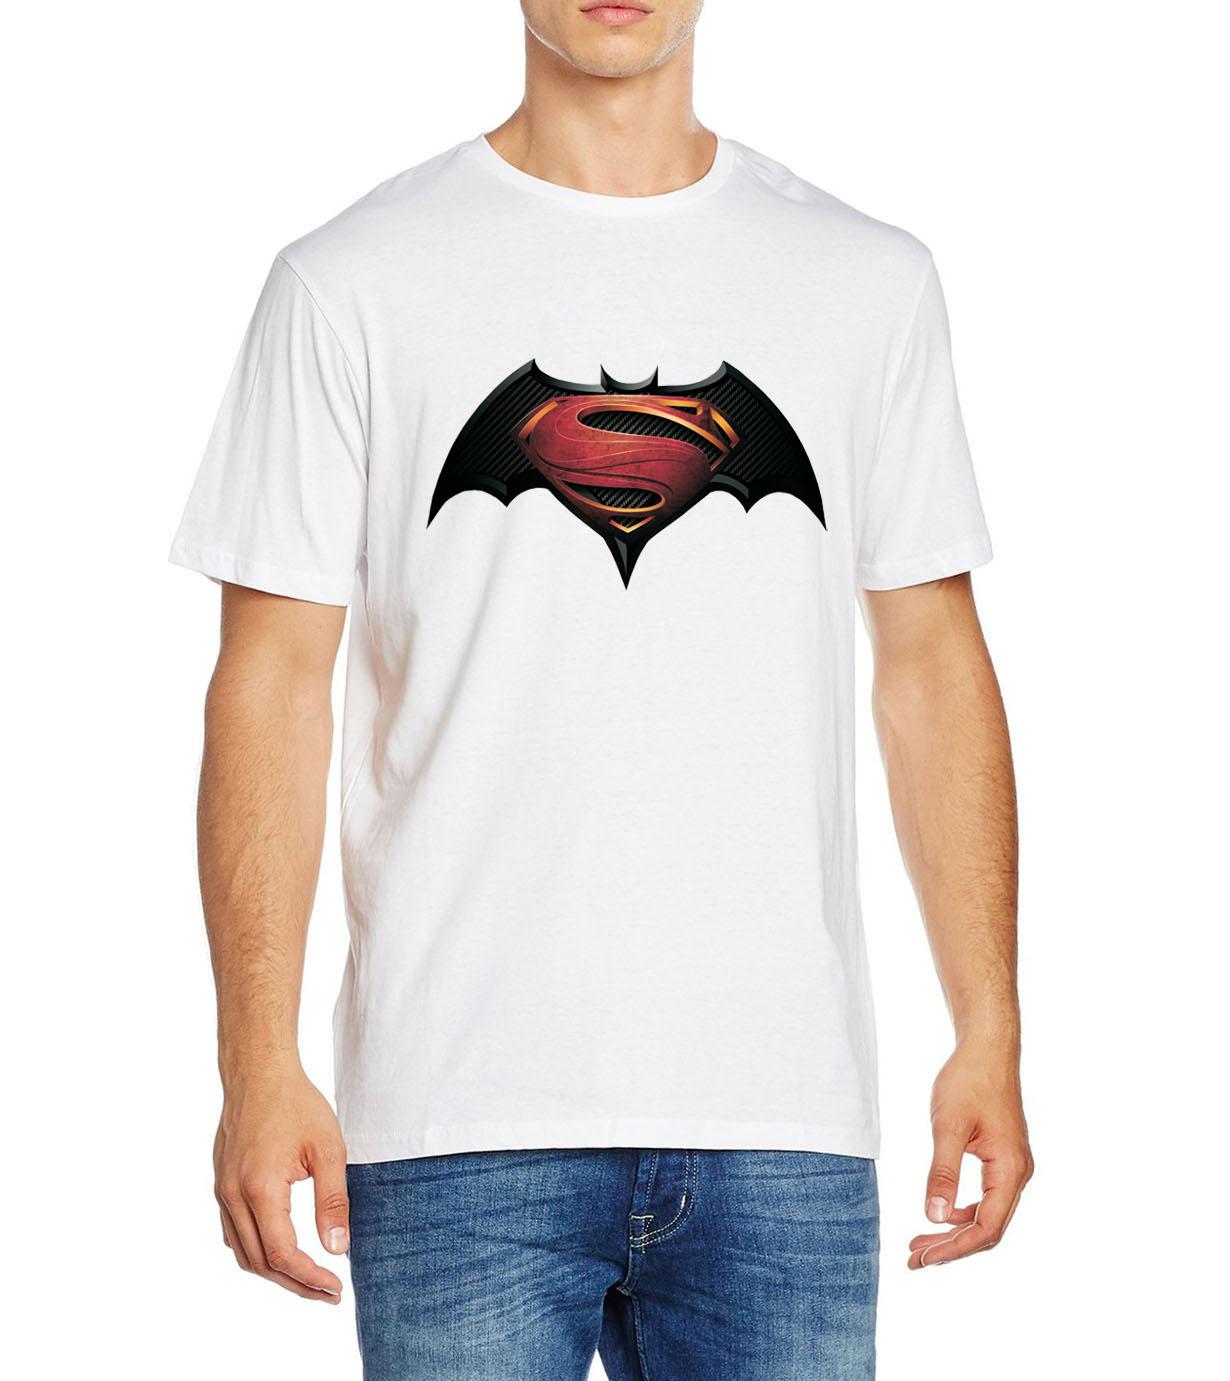 male harajuku bodybuilding camisetas 2019 summer men's fashion  printed t shirts short sleeve cotton fitness t-shirts